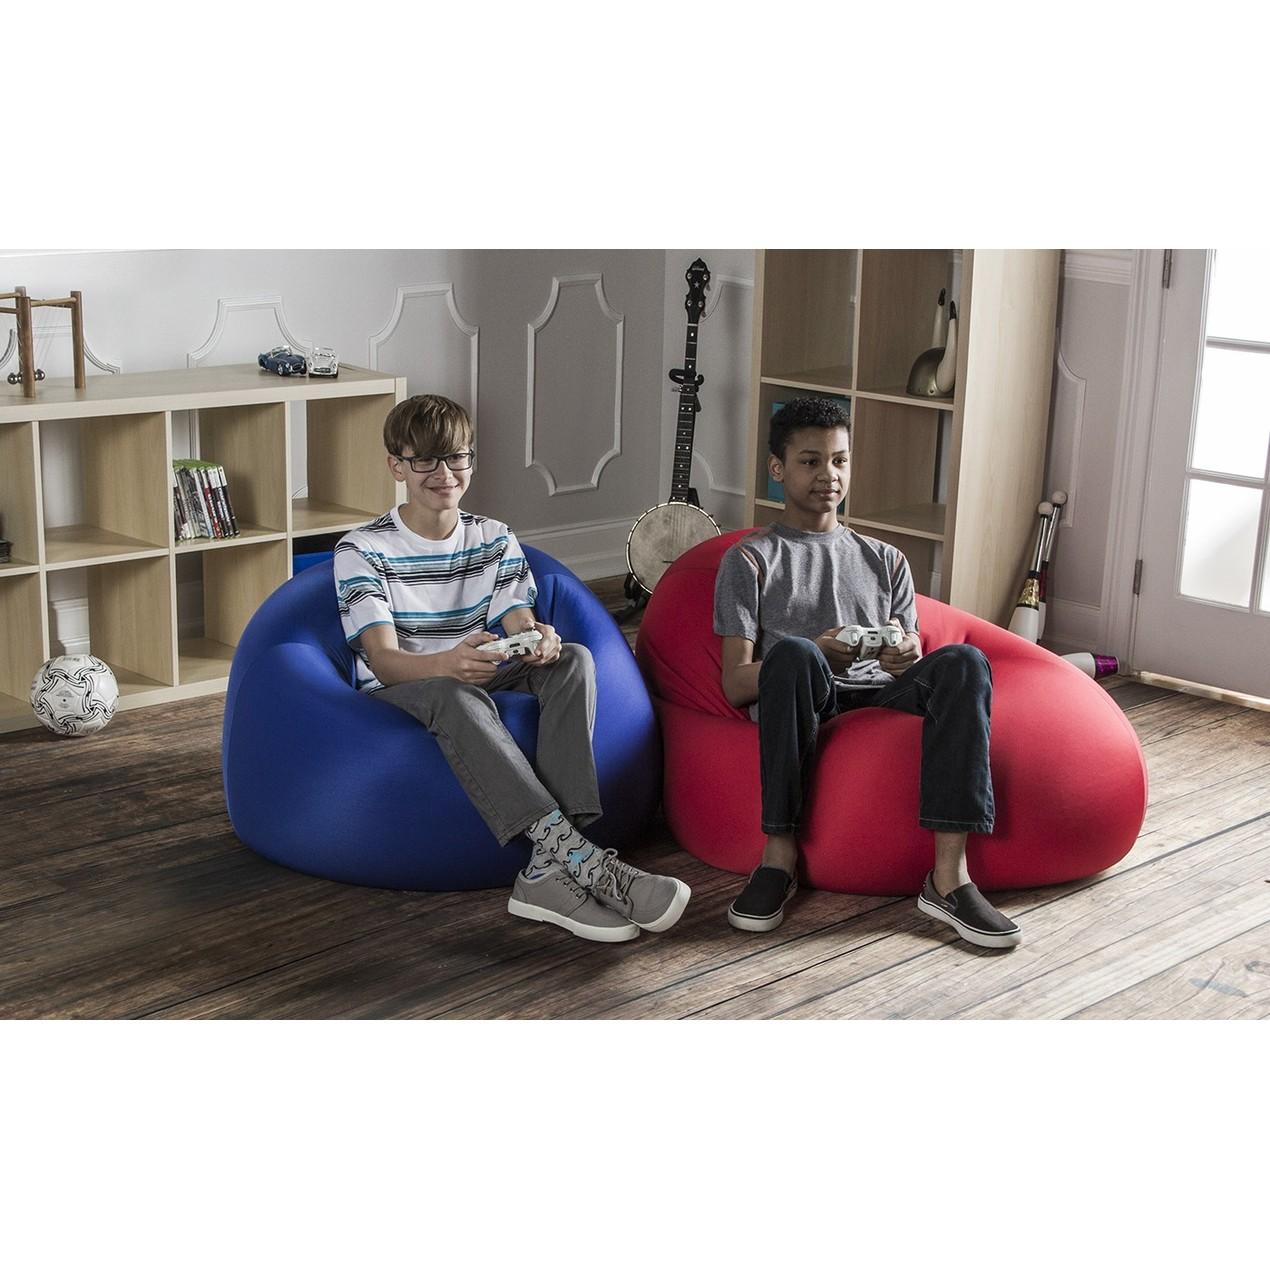 Surprising Nimbus Spandex Bean Bag Chair For Teens Tanga Customarchery Wood Chair Design Ideas Customarcherynet